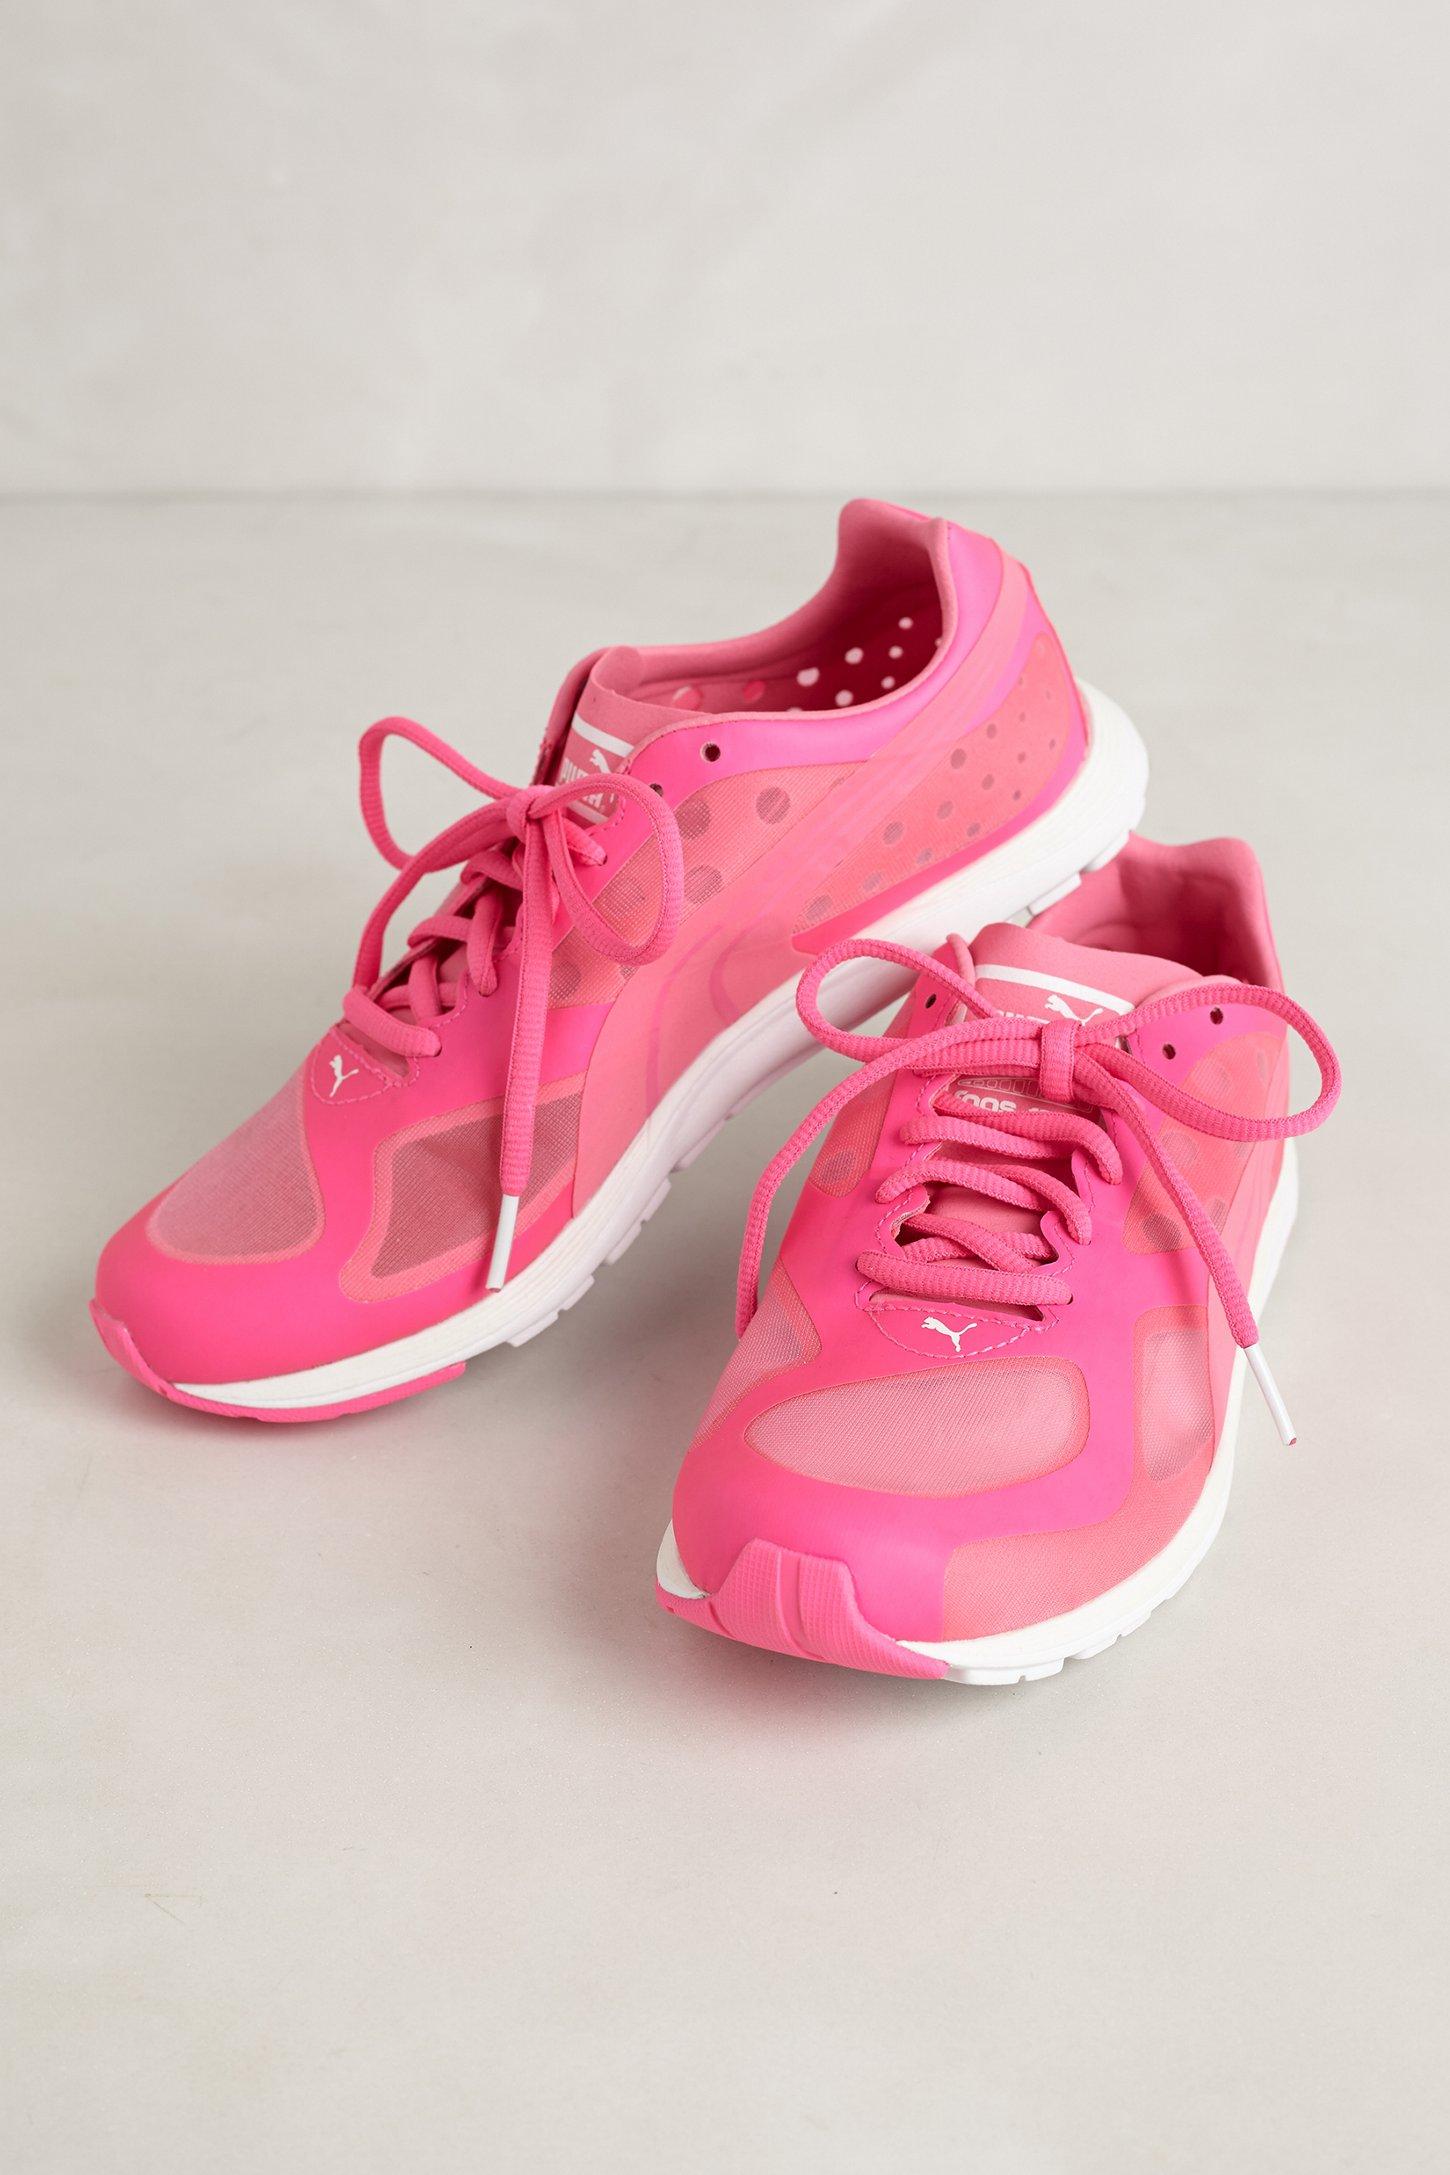 lyst puma faas 100 r glow sneakers in pink